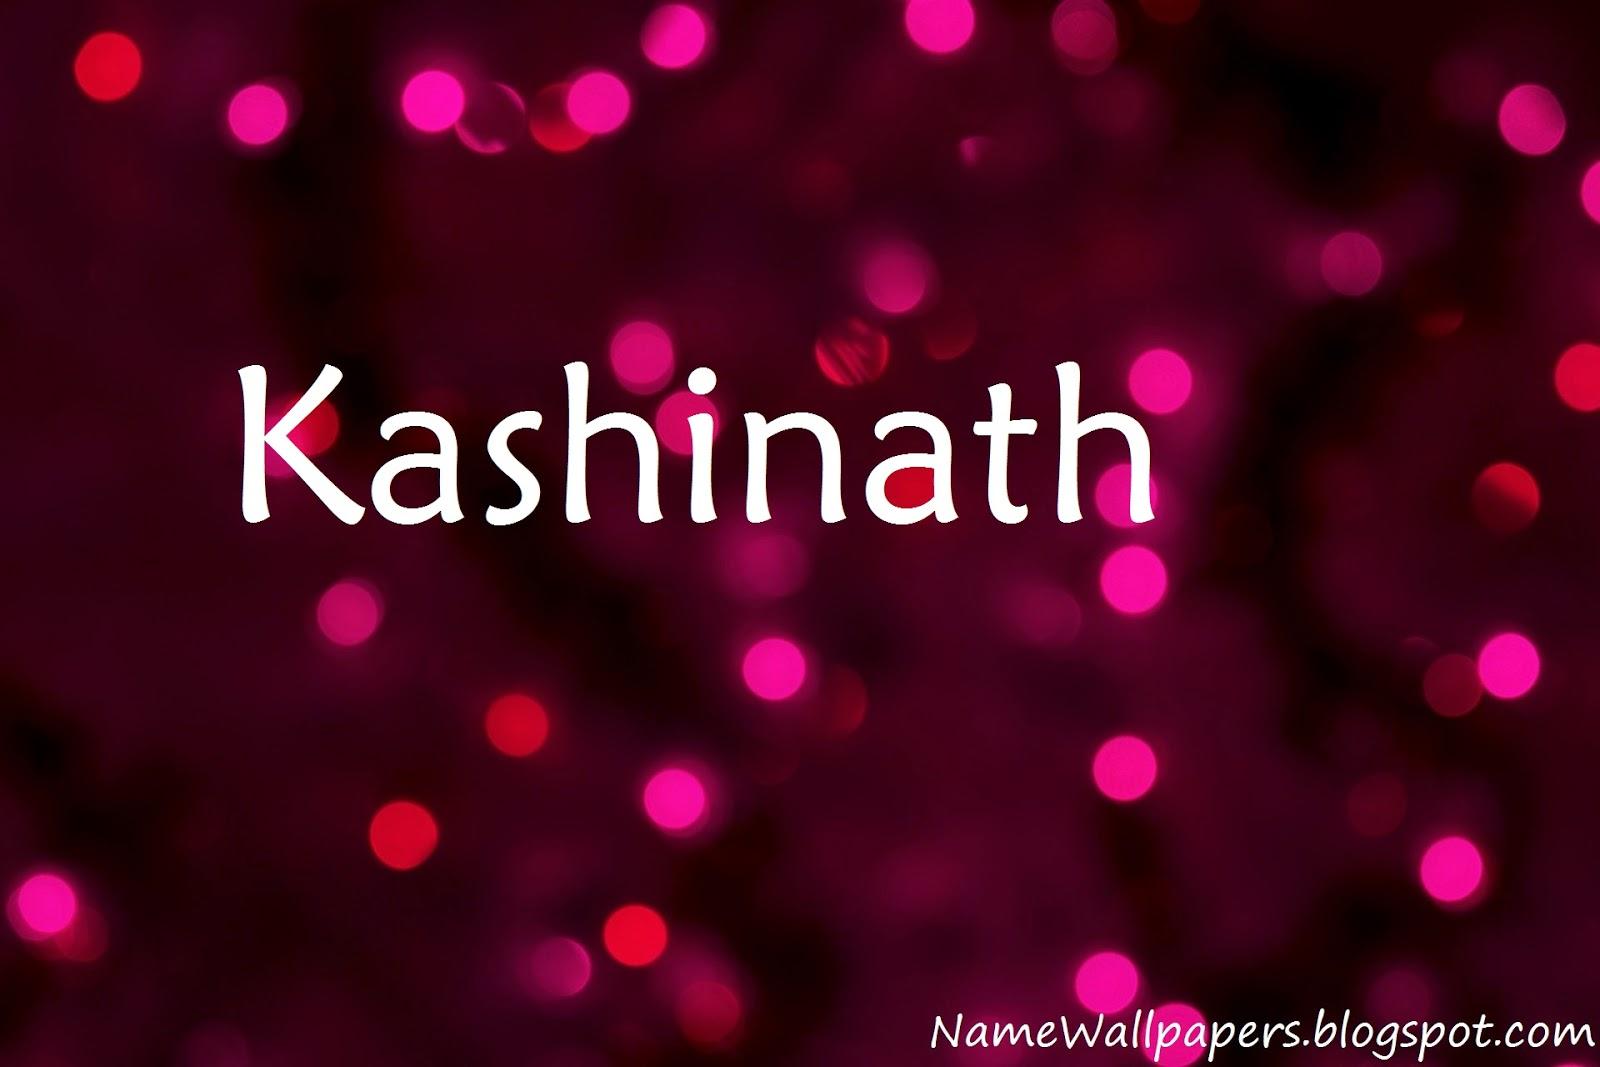 kashinath name